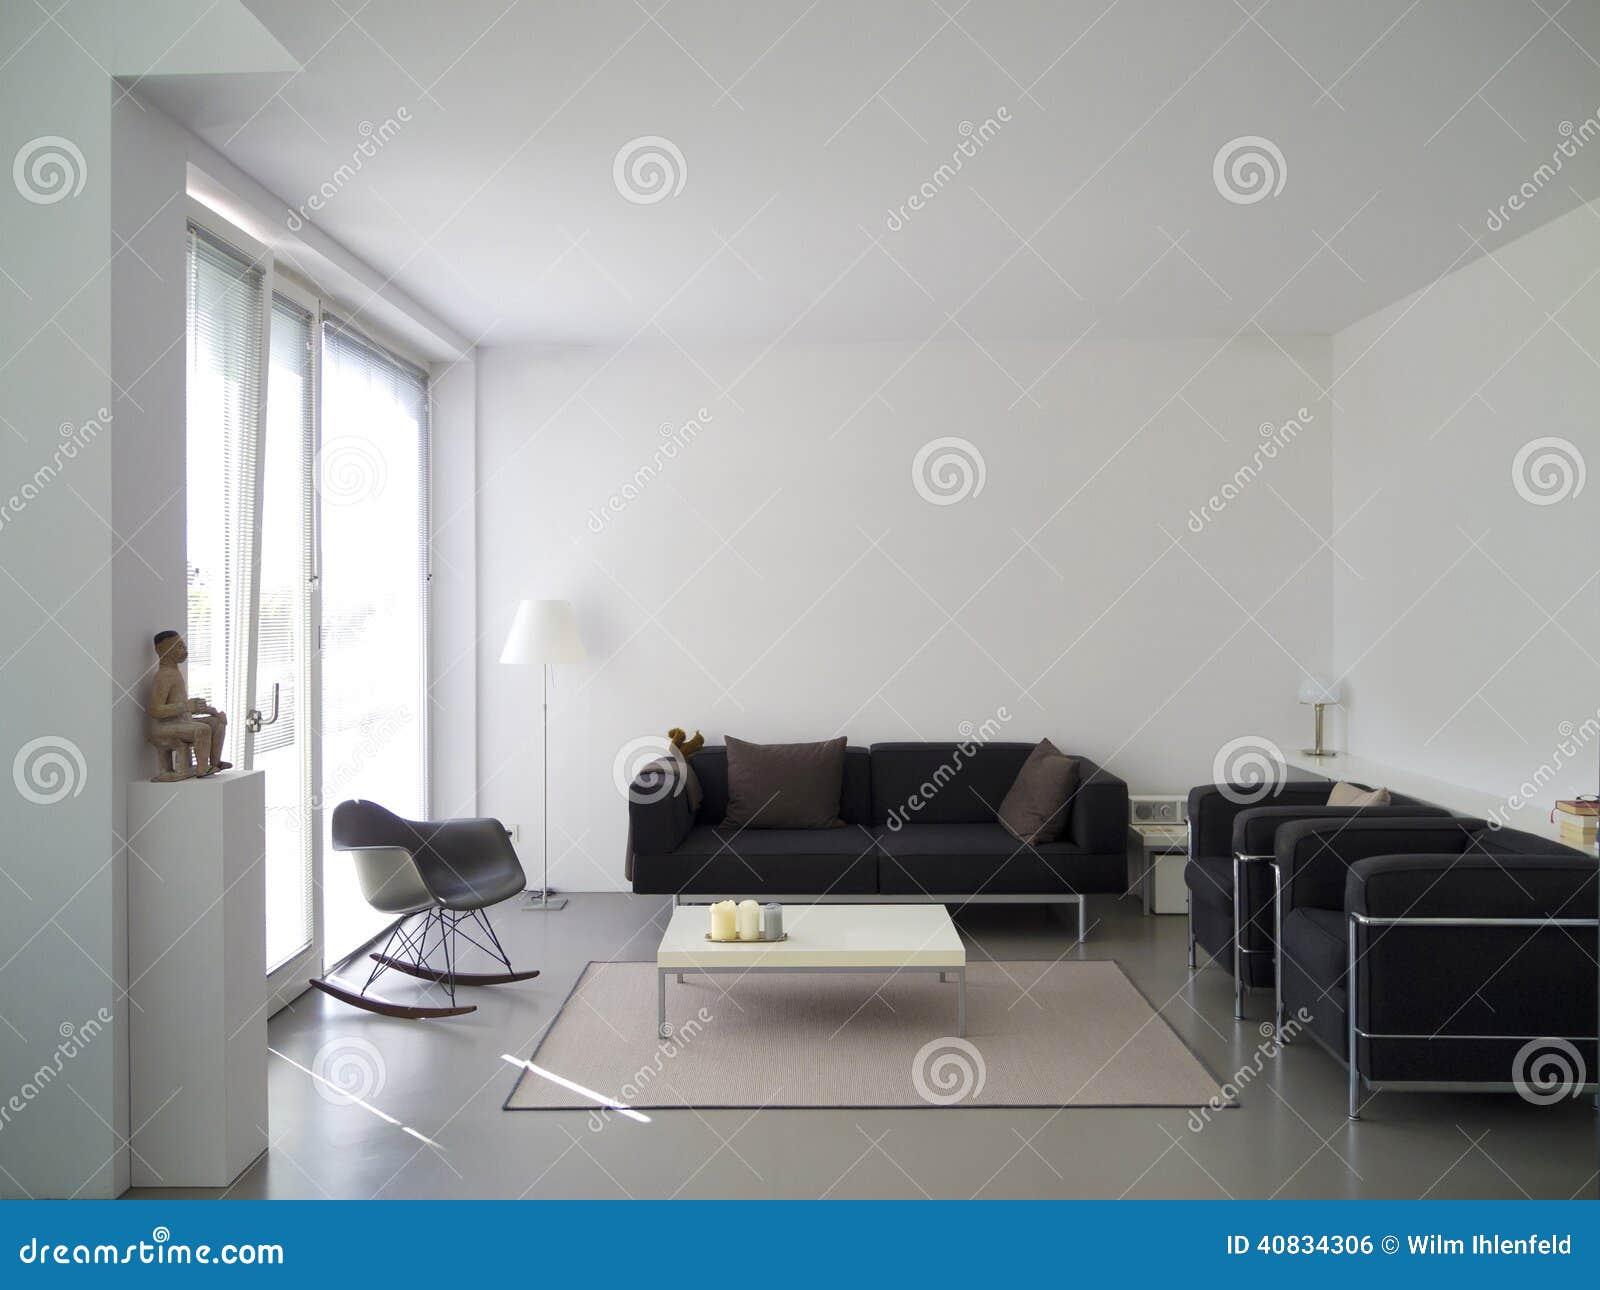 Woonkamer Zwart Grijs : Woonkamer zwart wit grijs perfect slaapkamer zwart goud